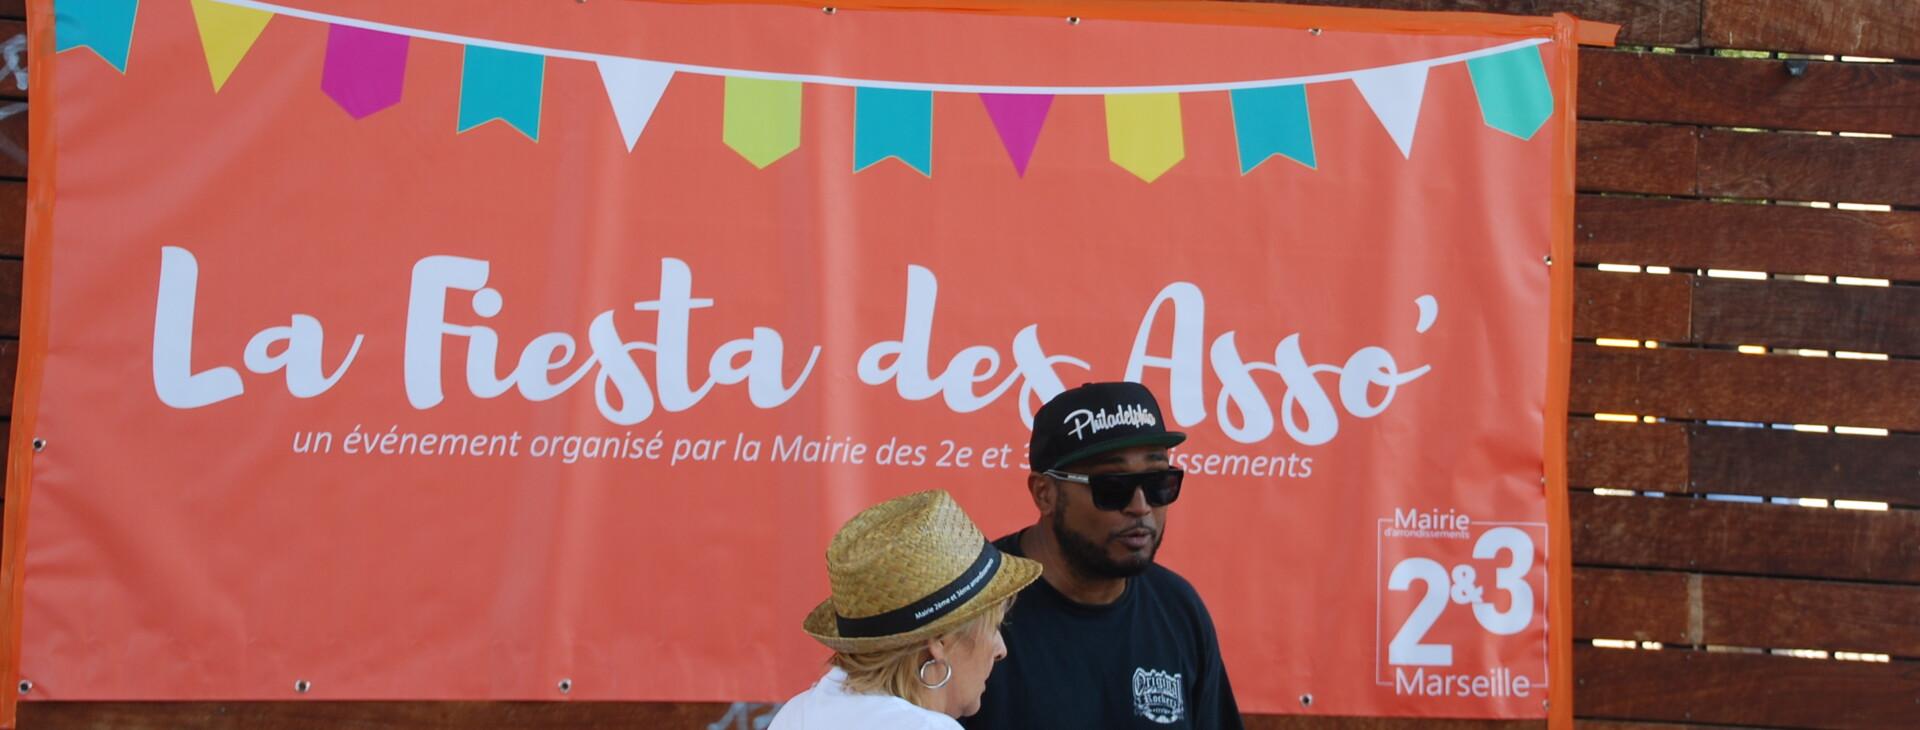 https://www.mairie-marseille2-3.com/wp-content/uploads/2021/09/DSC_7789-1920x730.jpg